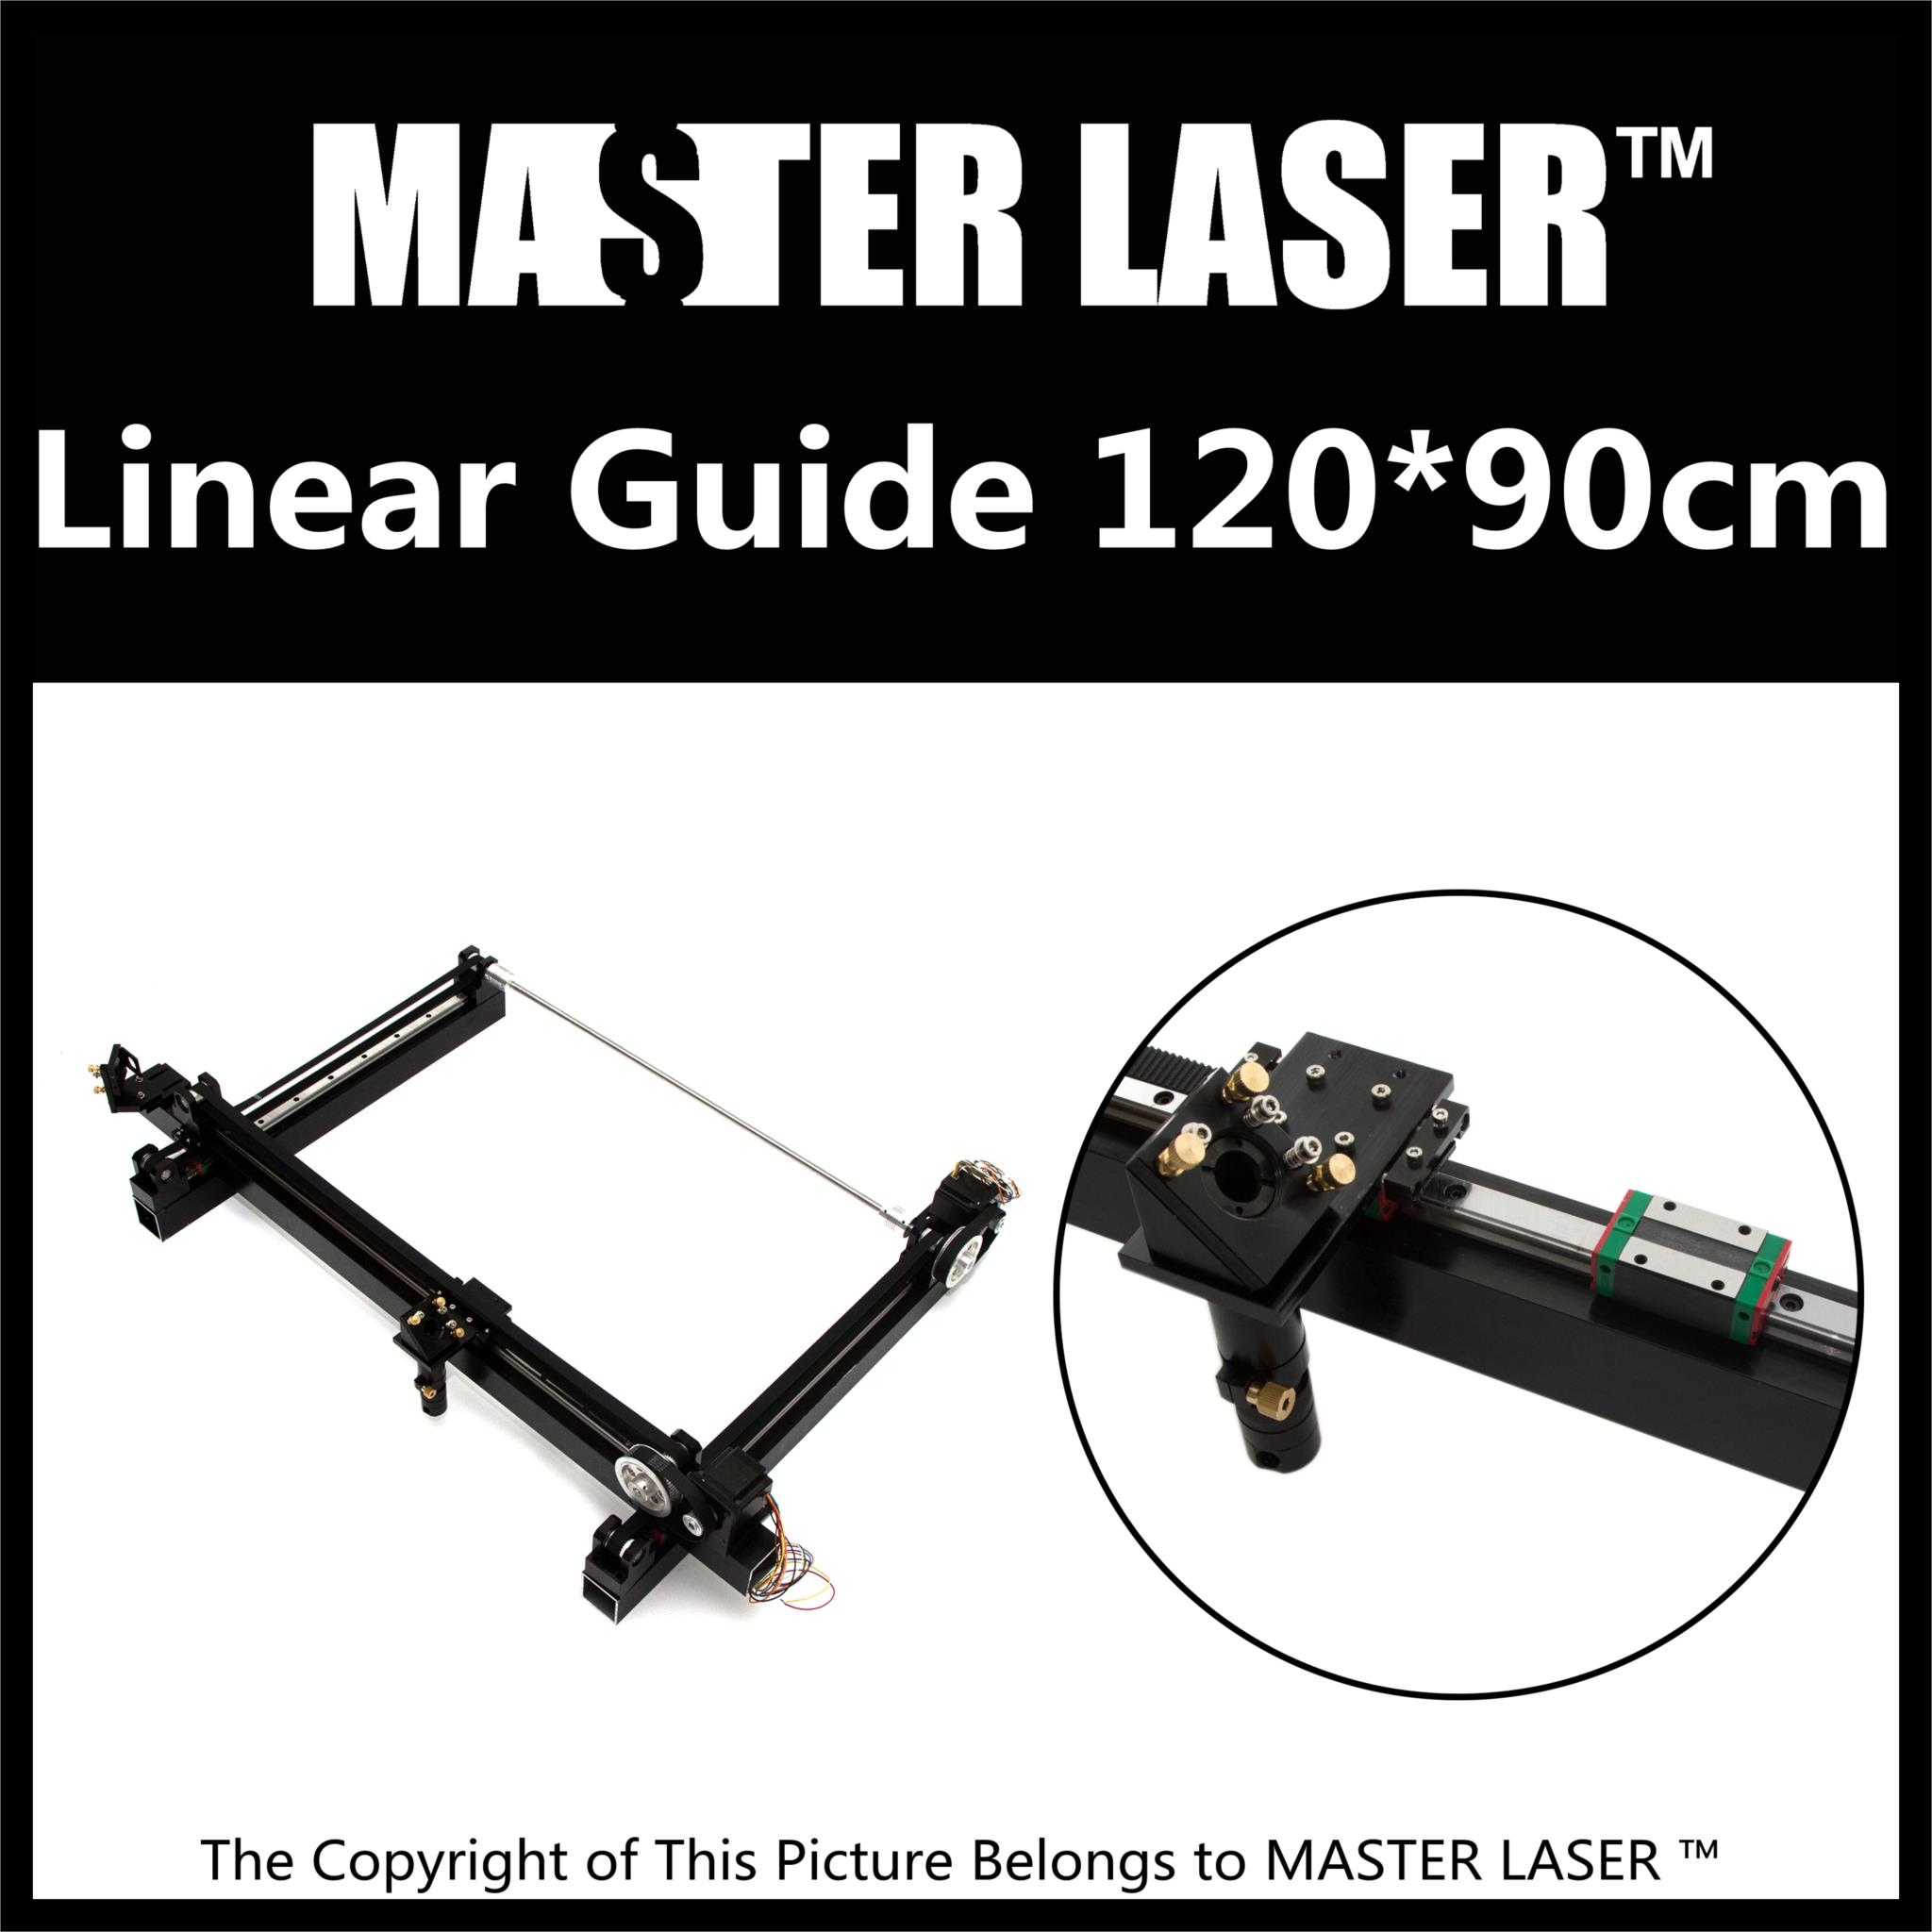 Best Quality CO2 Laser Mirror Mount Working Table Laser Line Laser Cut Frames high quality southern laser cast line instrument marking device 4lines ml313 the laser level